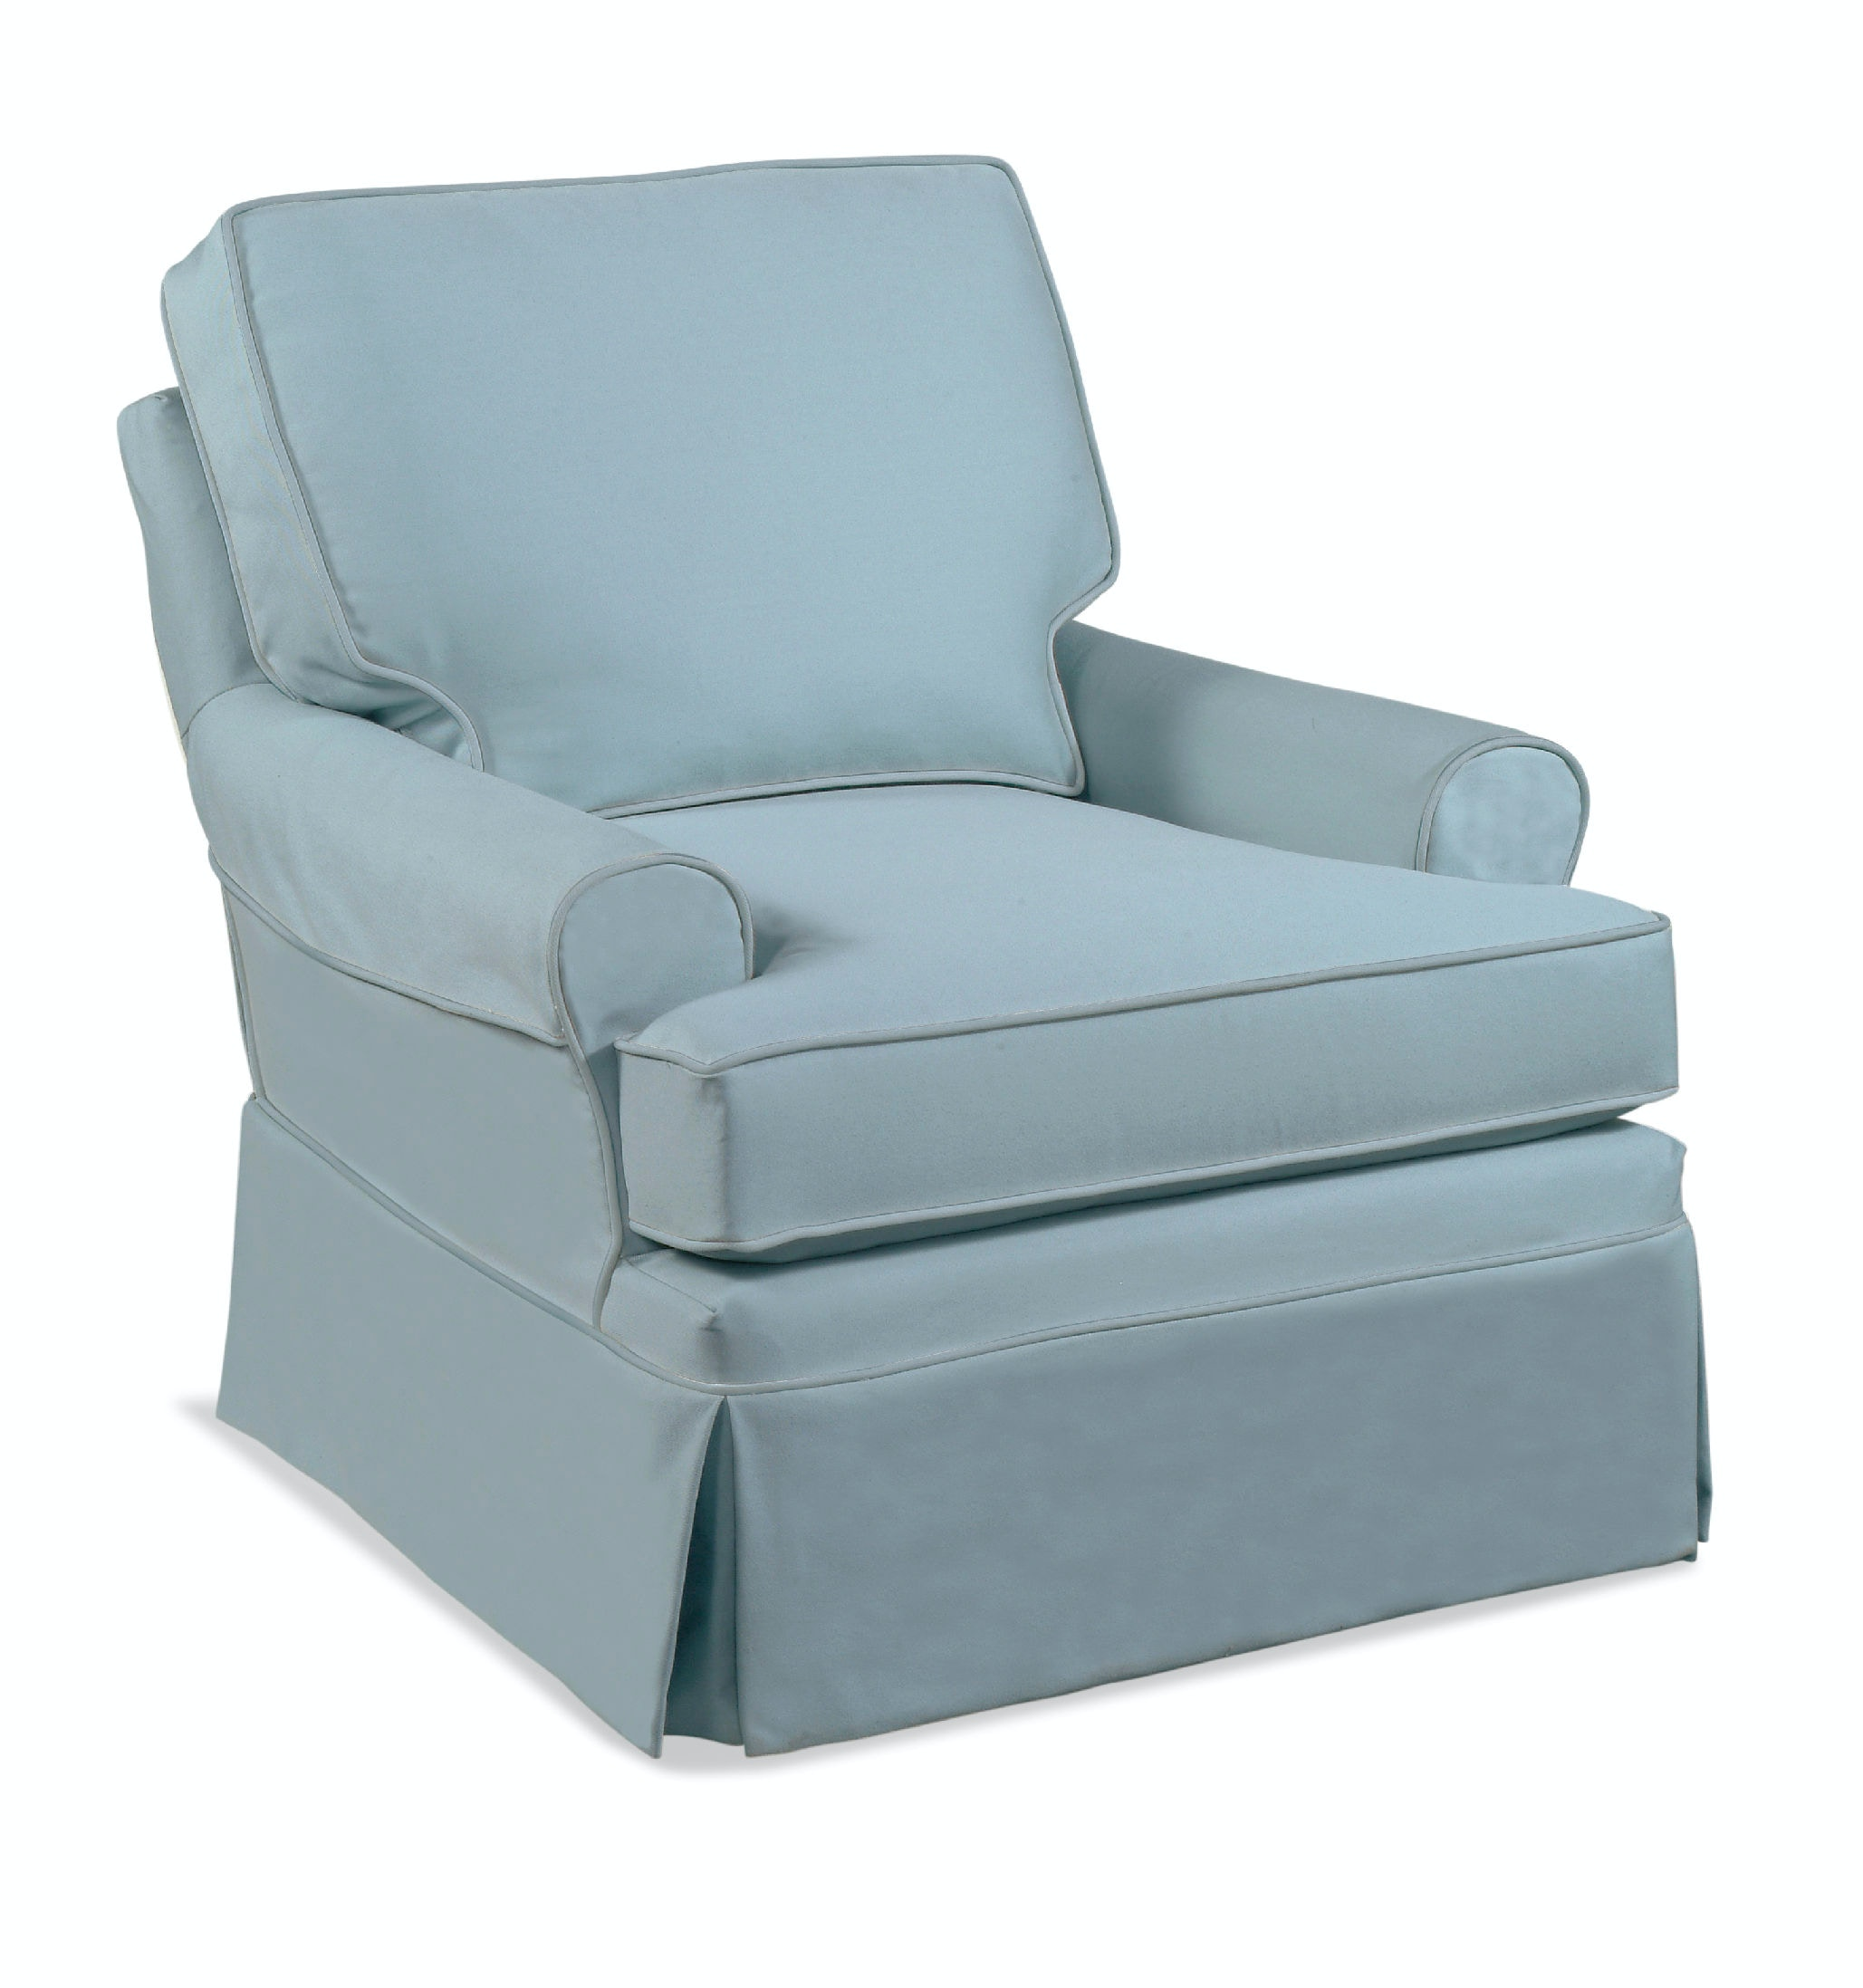 cover furniture. Braxton Culler Belmont Glider With Slip Cover 621-002XP Cover Furniture A